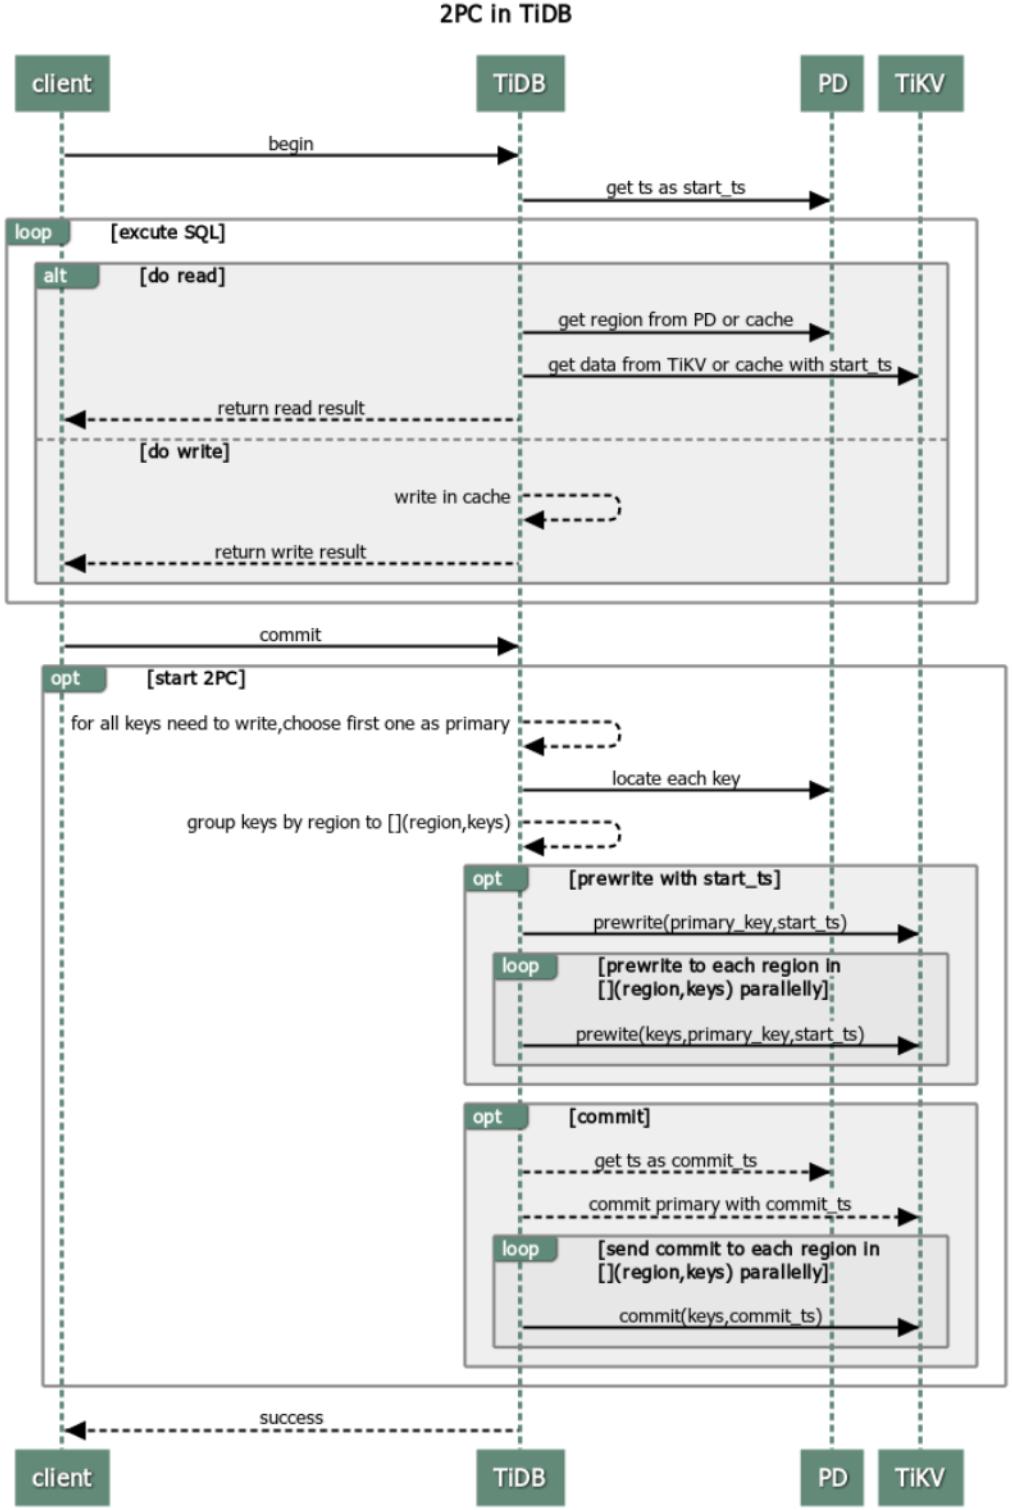 TiDB 中乐观事务的两阶段提交